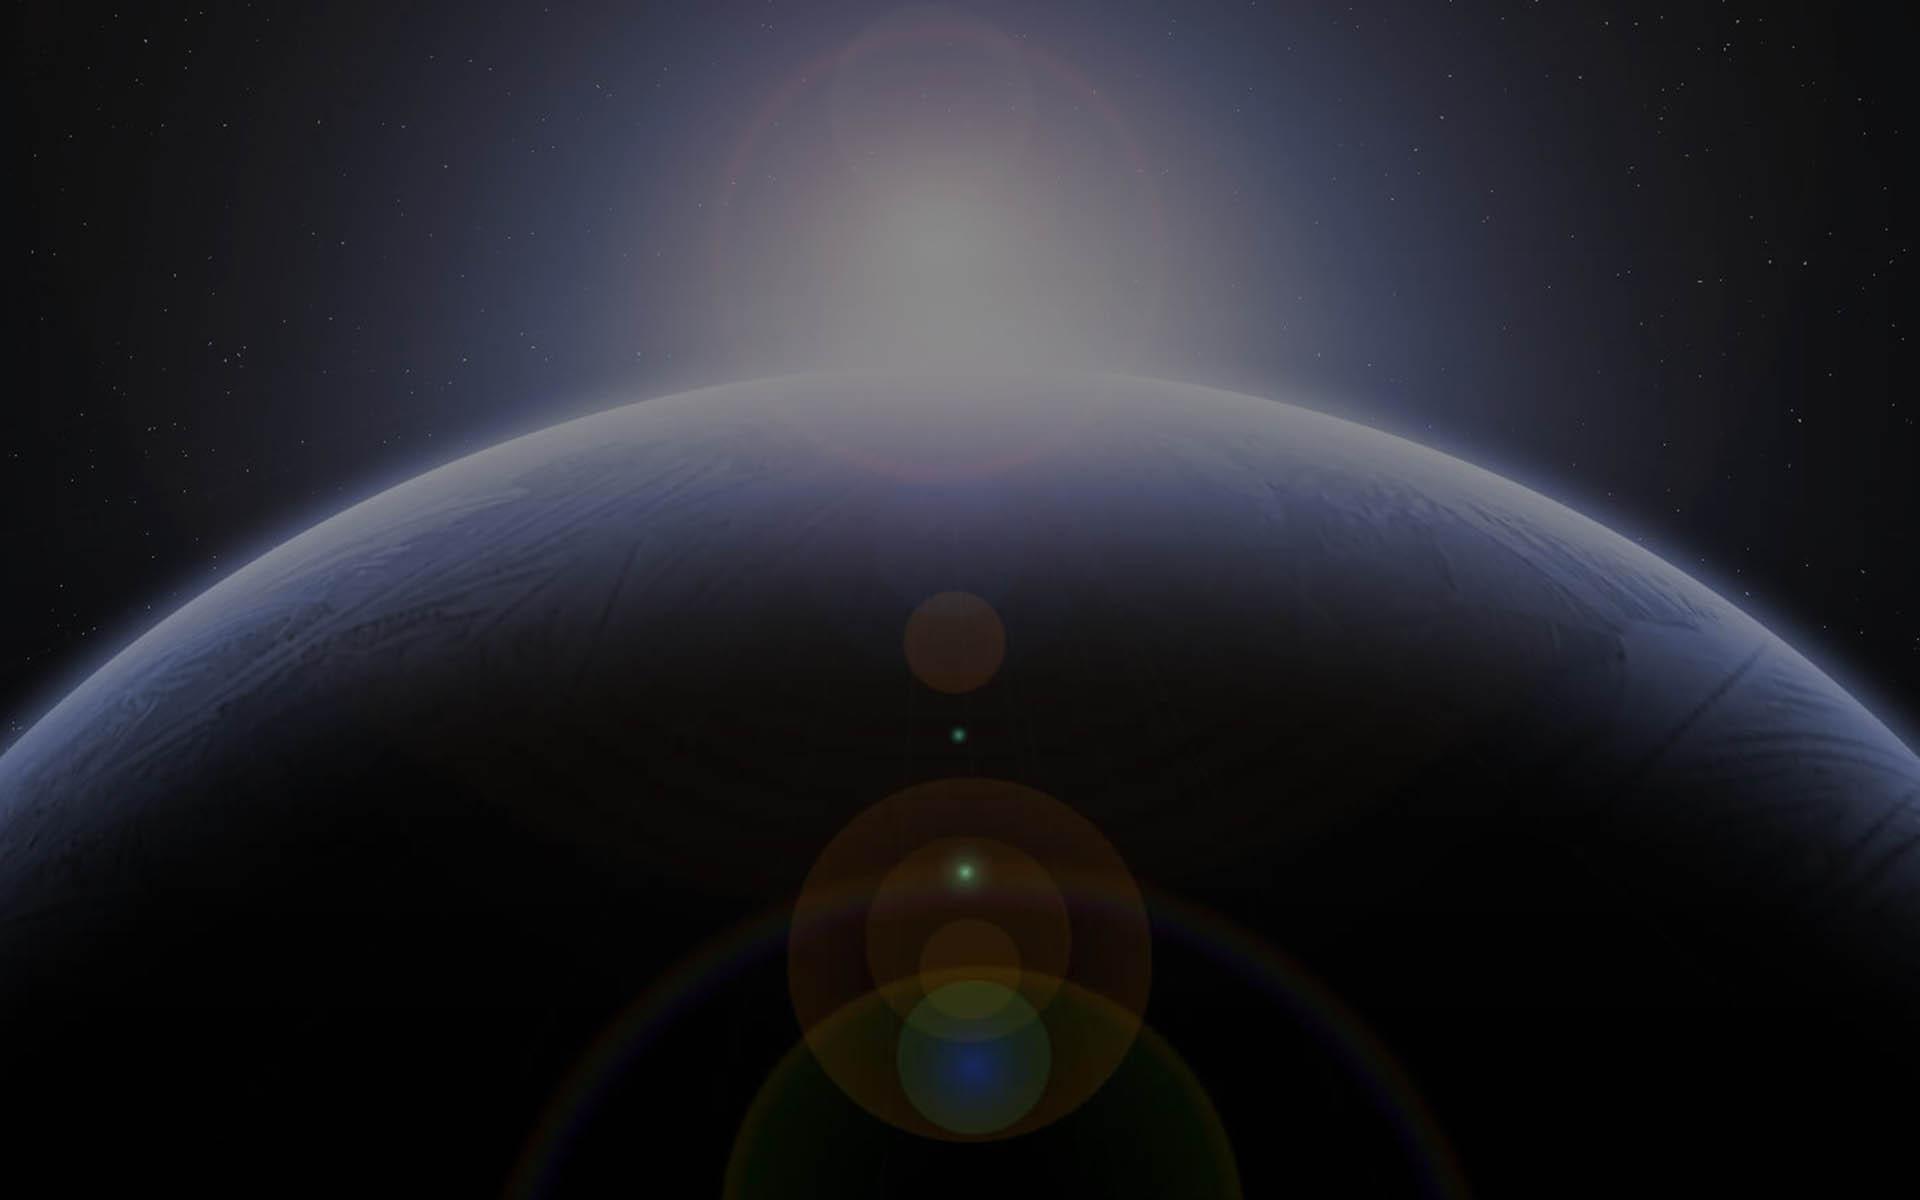 Ark Announces Mainnet Launch